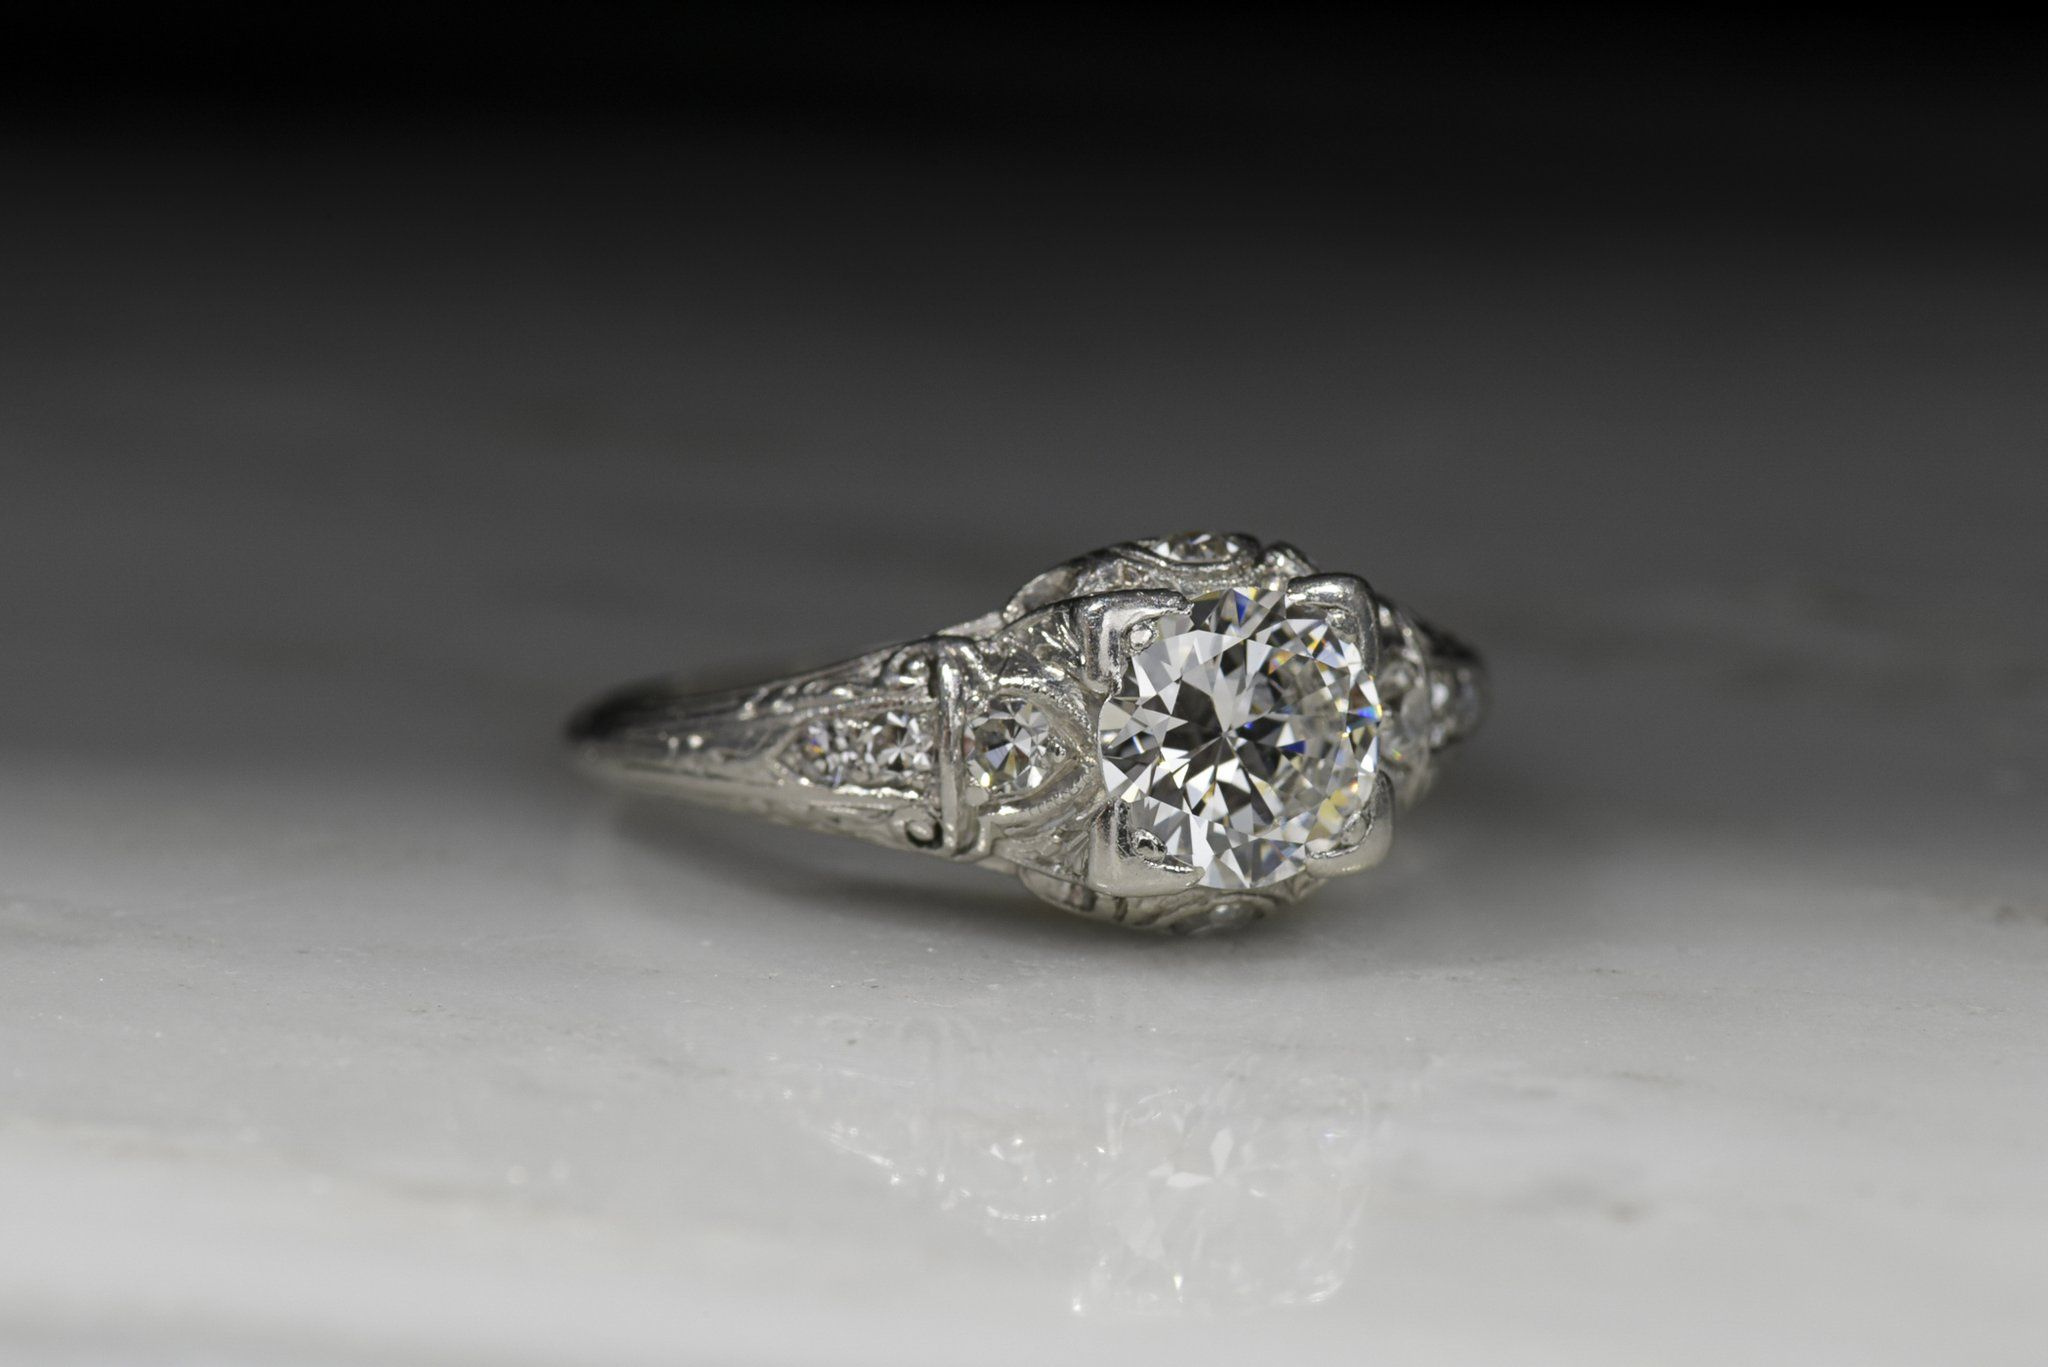 32d936a3d Vintage 1920s Edwardian Old European Cut Diamond Engagement Ring - Pebble  and Polish